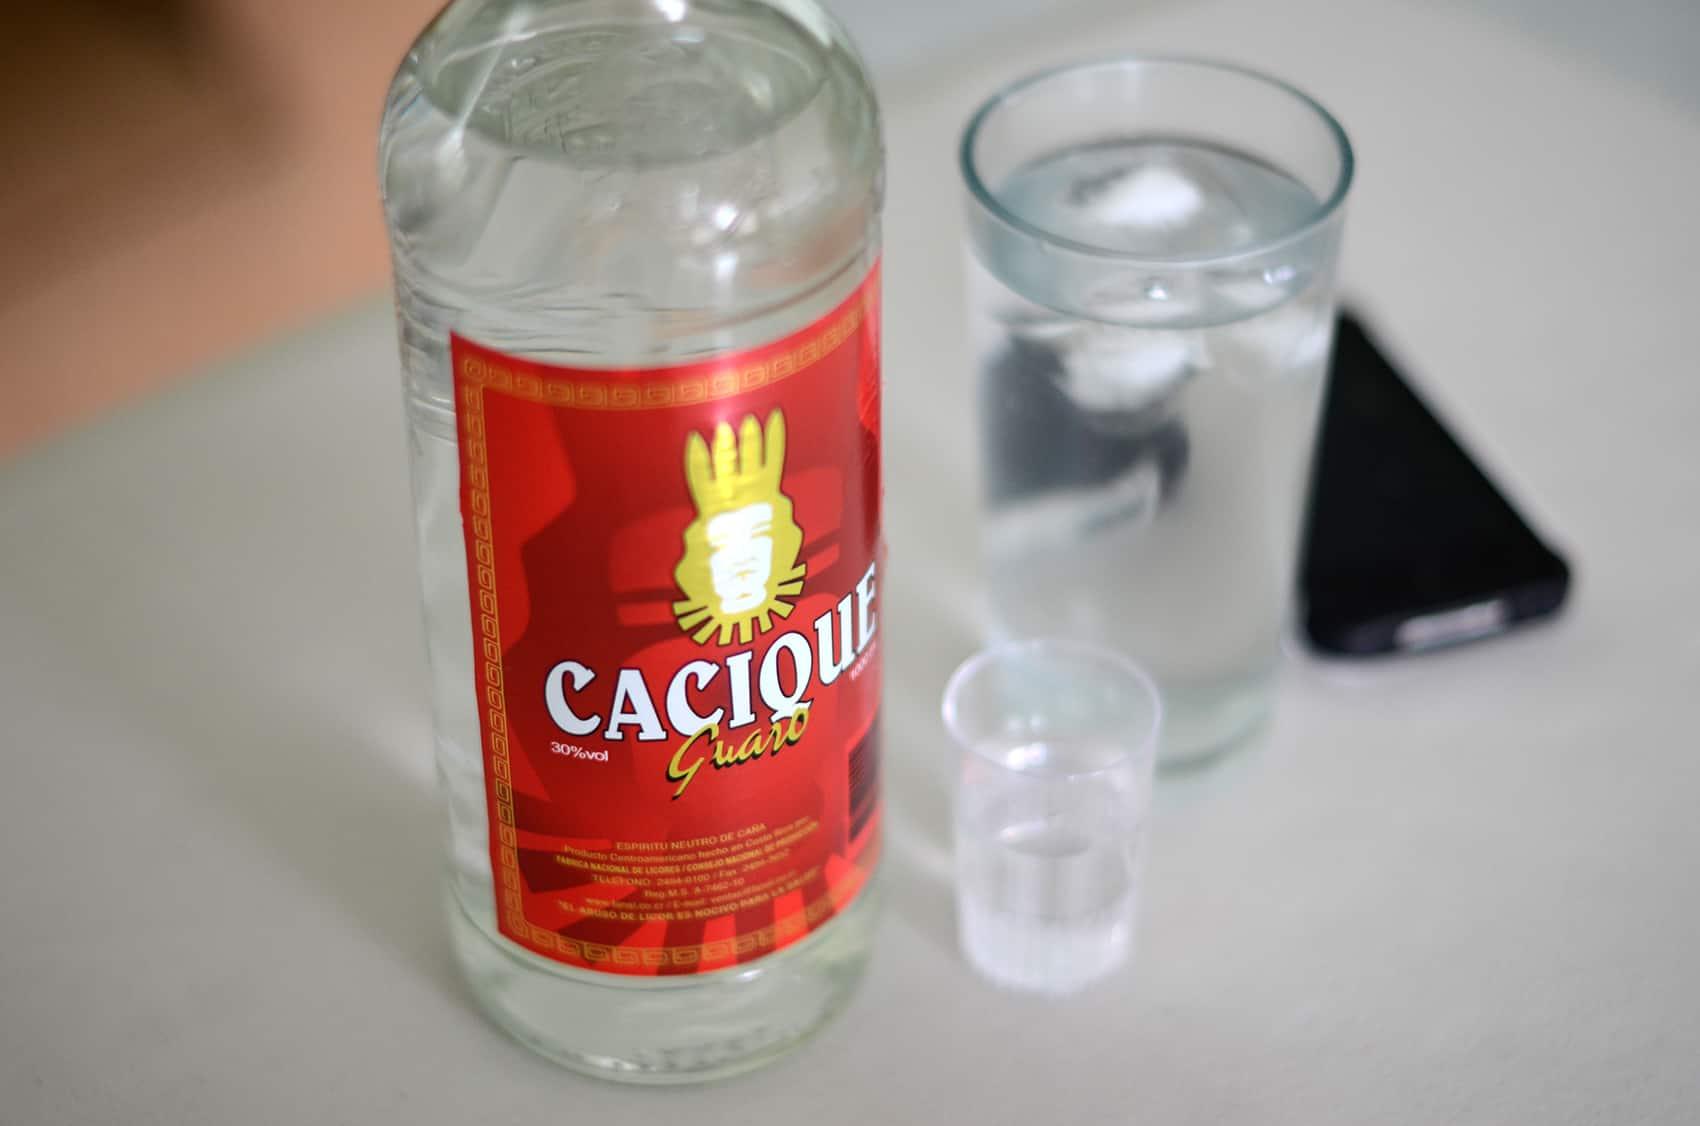 Guaro, Costa Rica's national liquor.